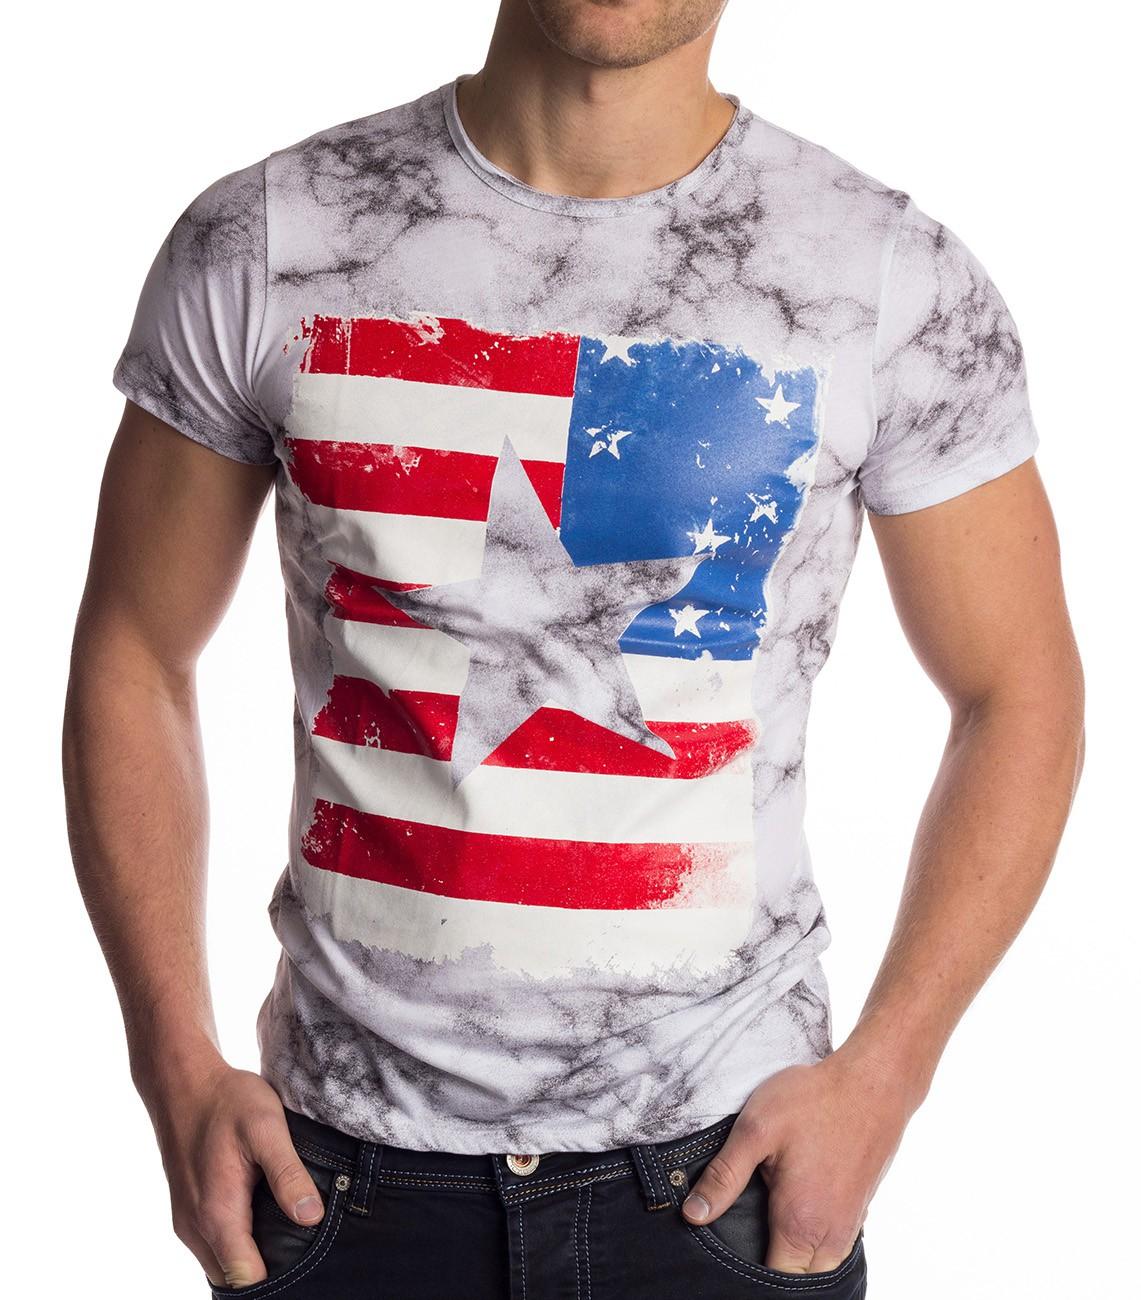 Mens vintage t shirt america flag usa short sleeve shirt for Mens shirt with stars